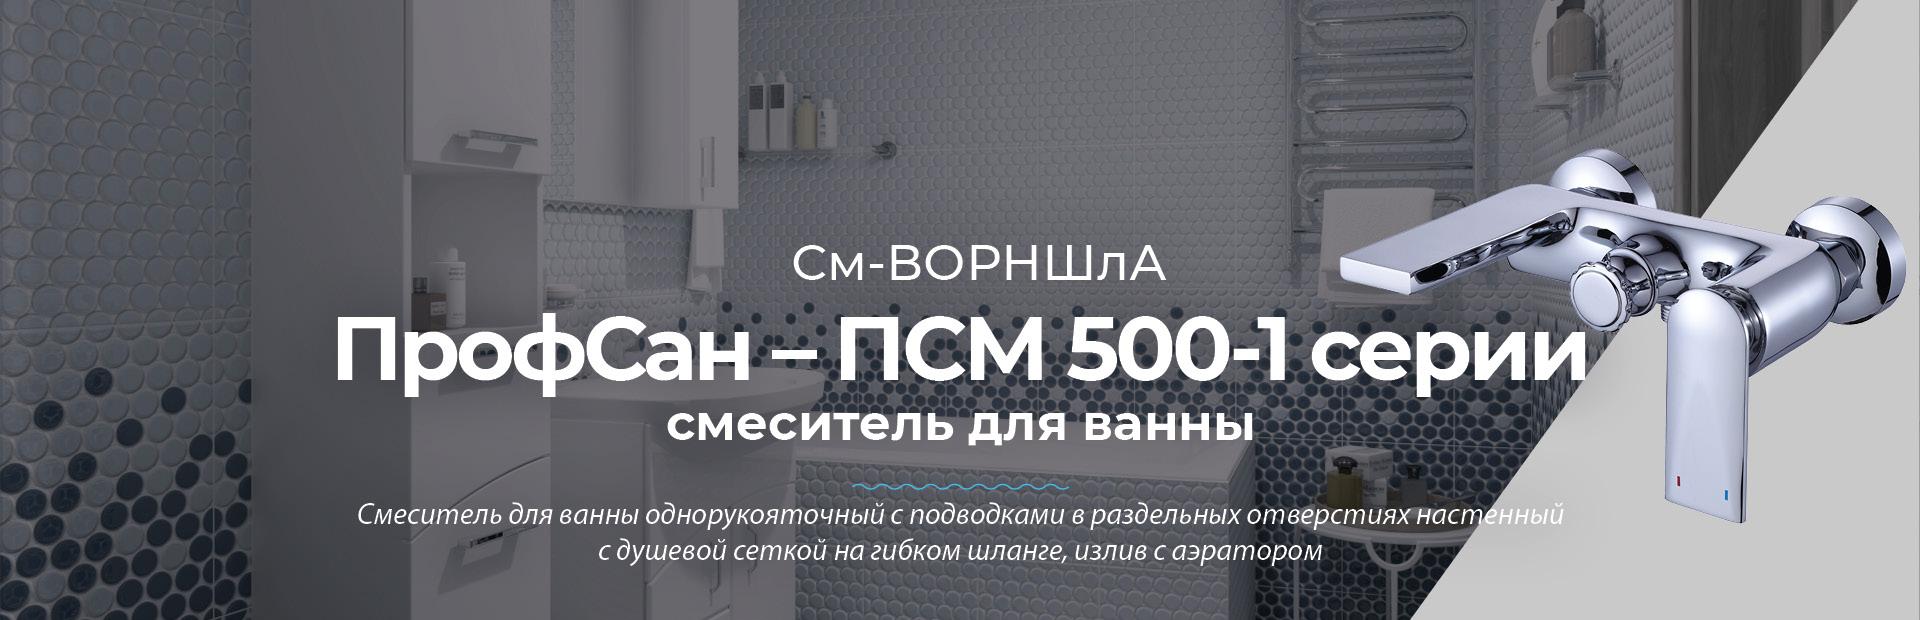 Баннер со смесителем Профсан ПСМ 500-1